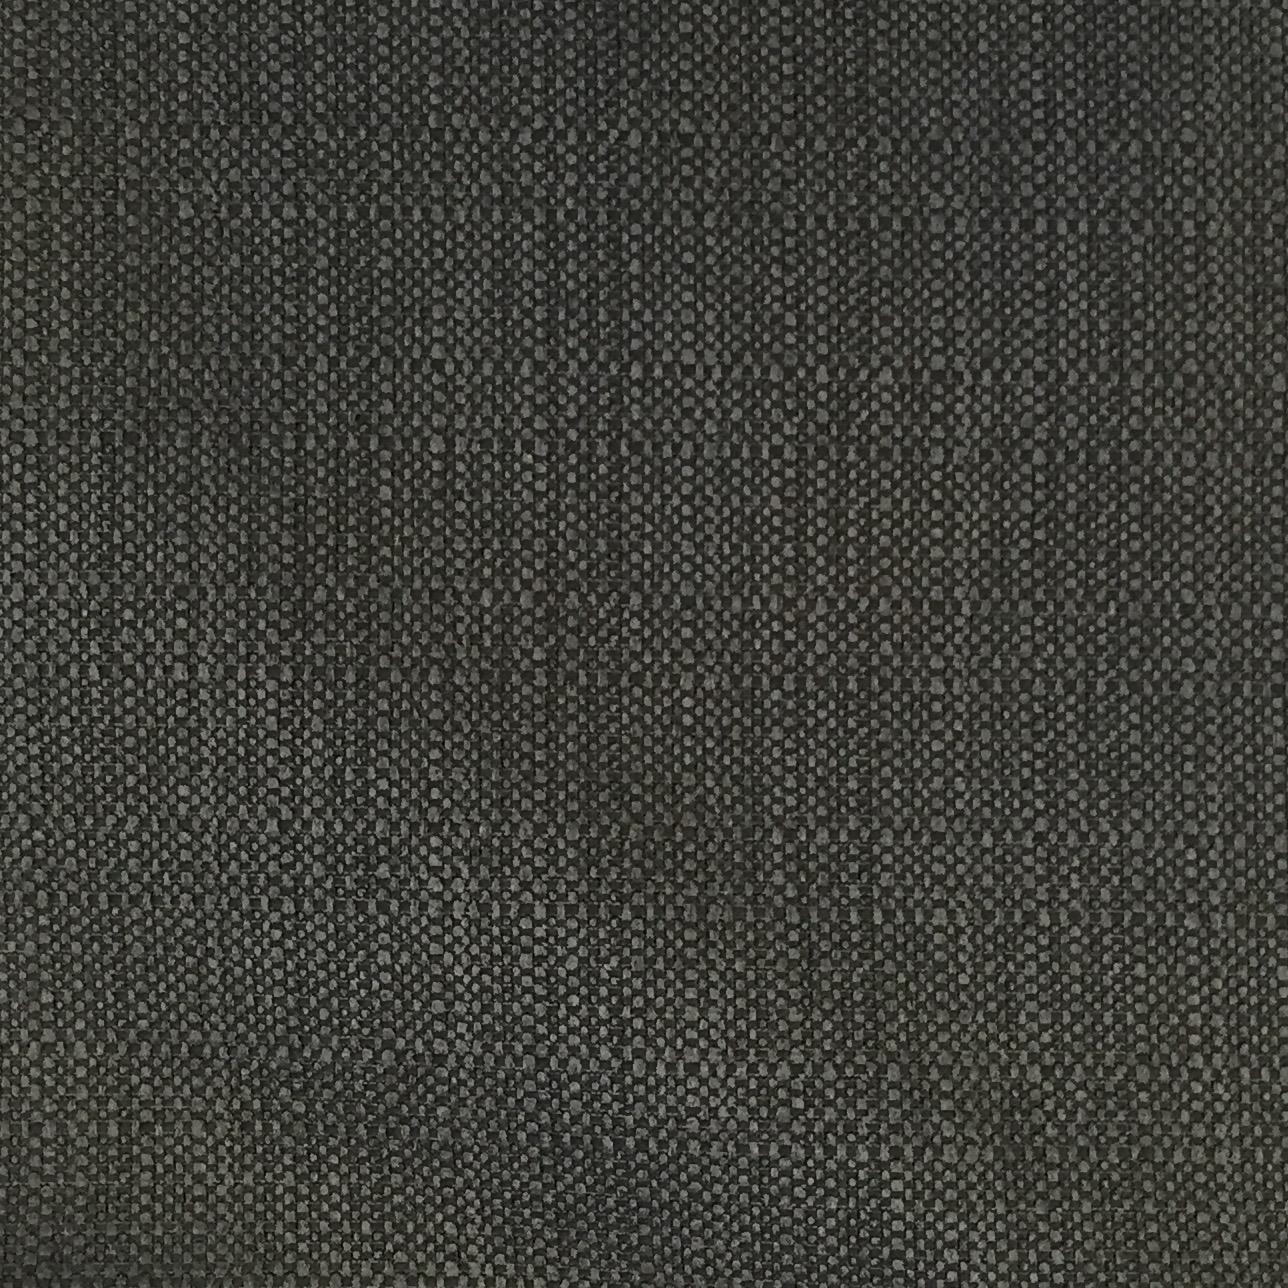 Charcoal Textured Linen